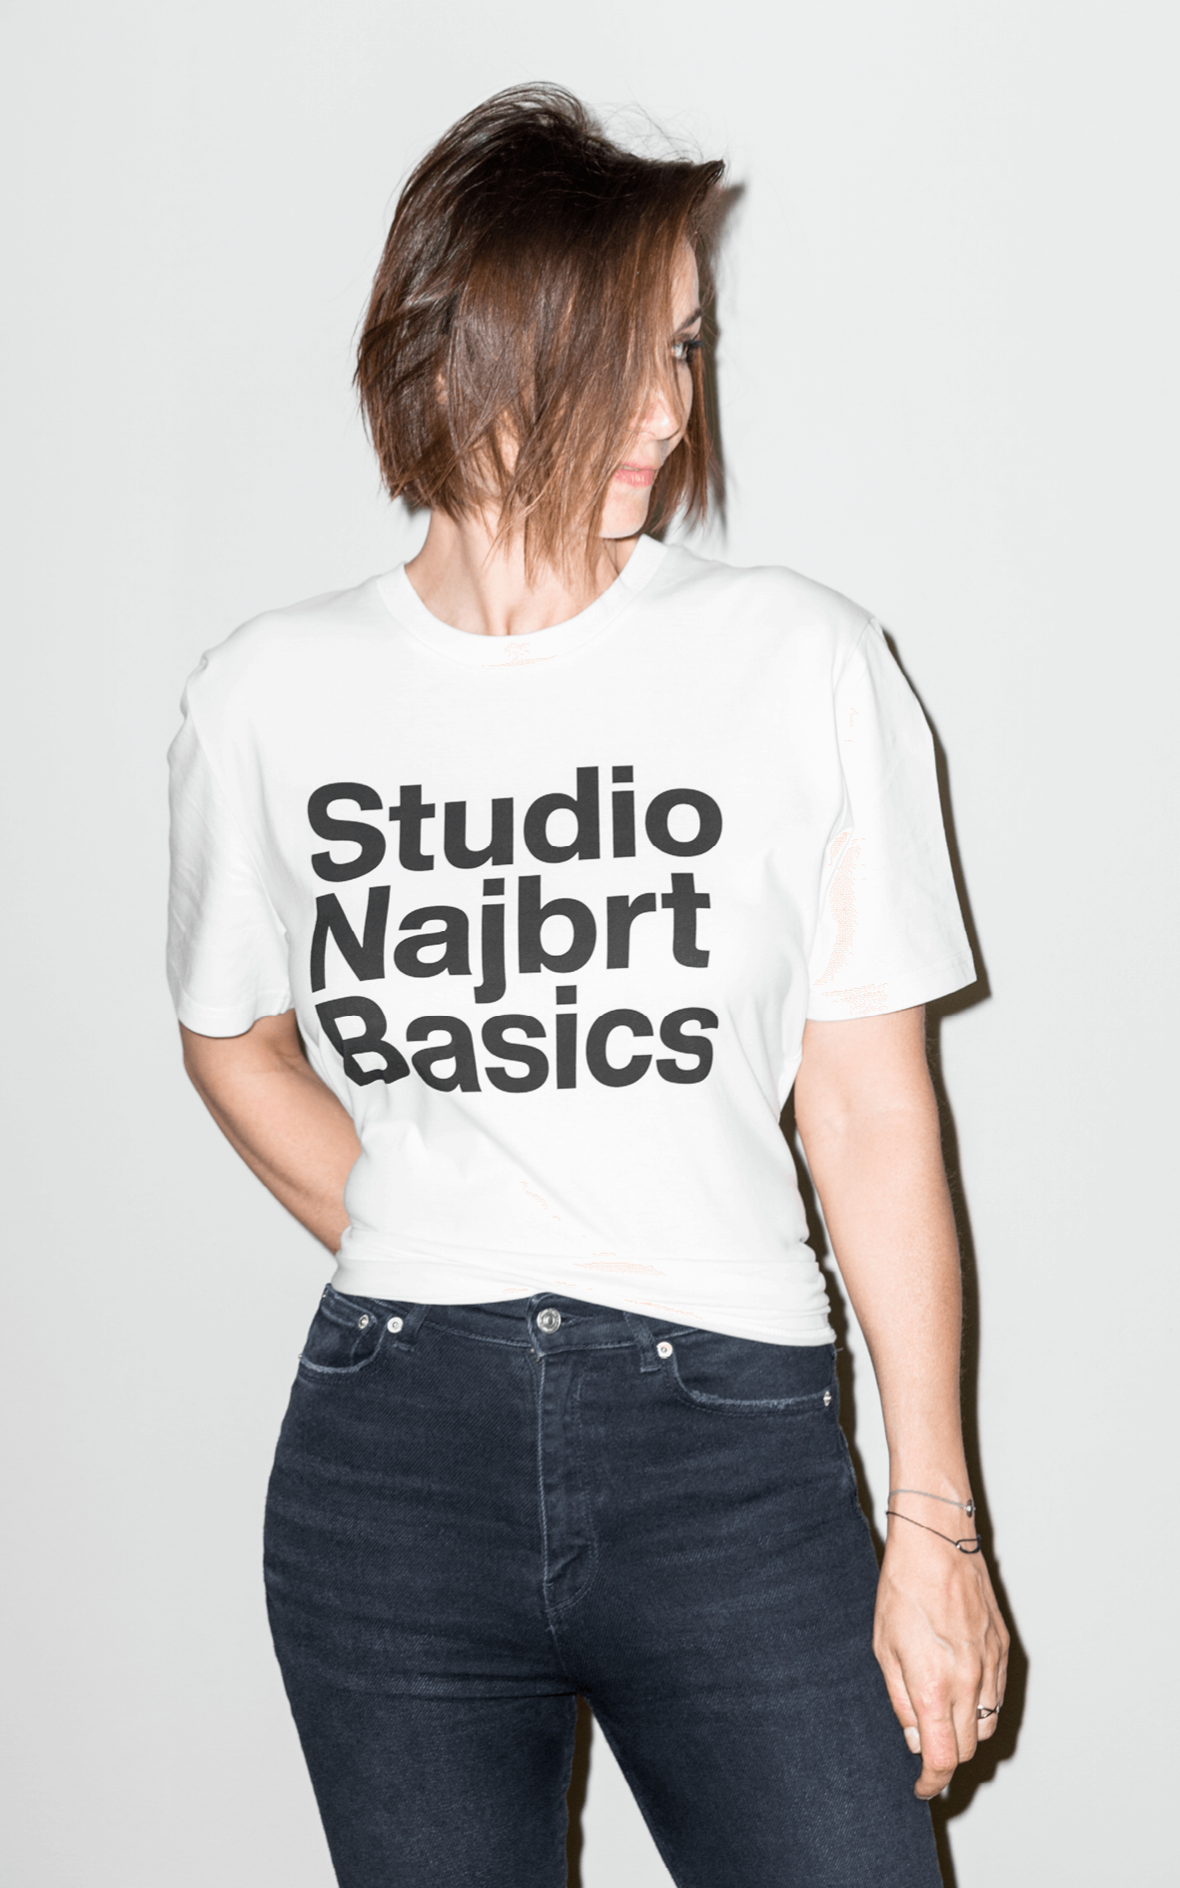 Z katalogu k výstavě Studio Najbrt Basics